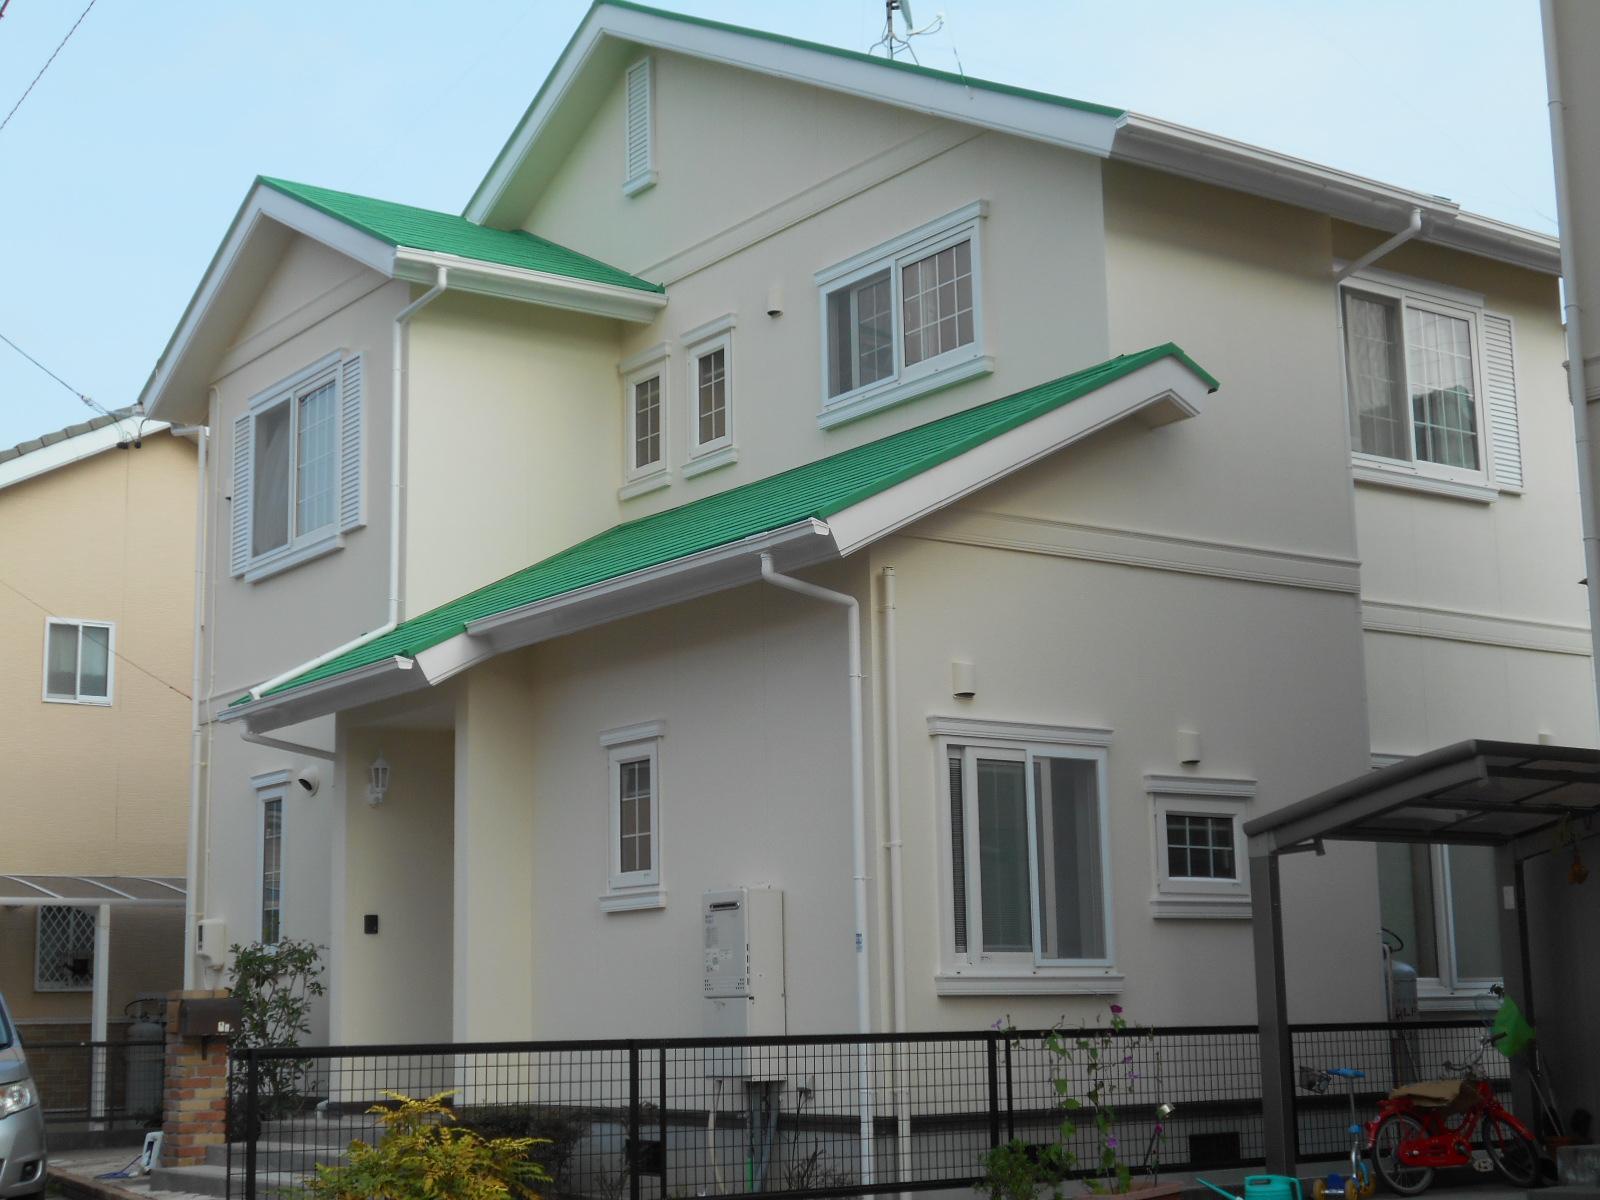 防カビ防藻効果のある家[浜松市南区の加藤塗装] 外壁塗装、屋根塗装